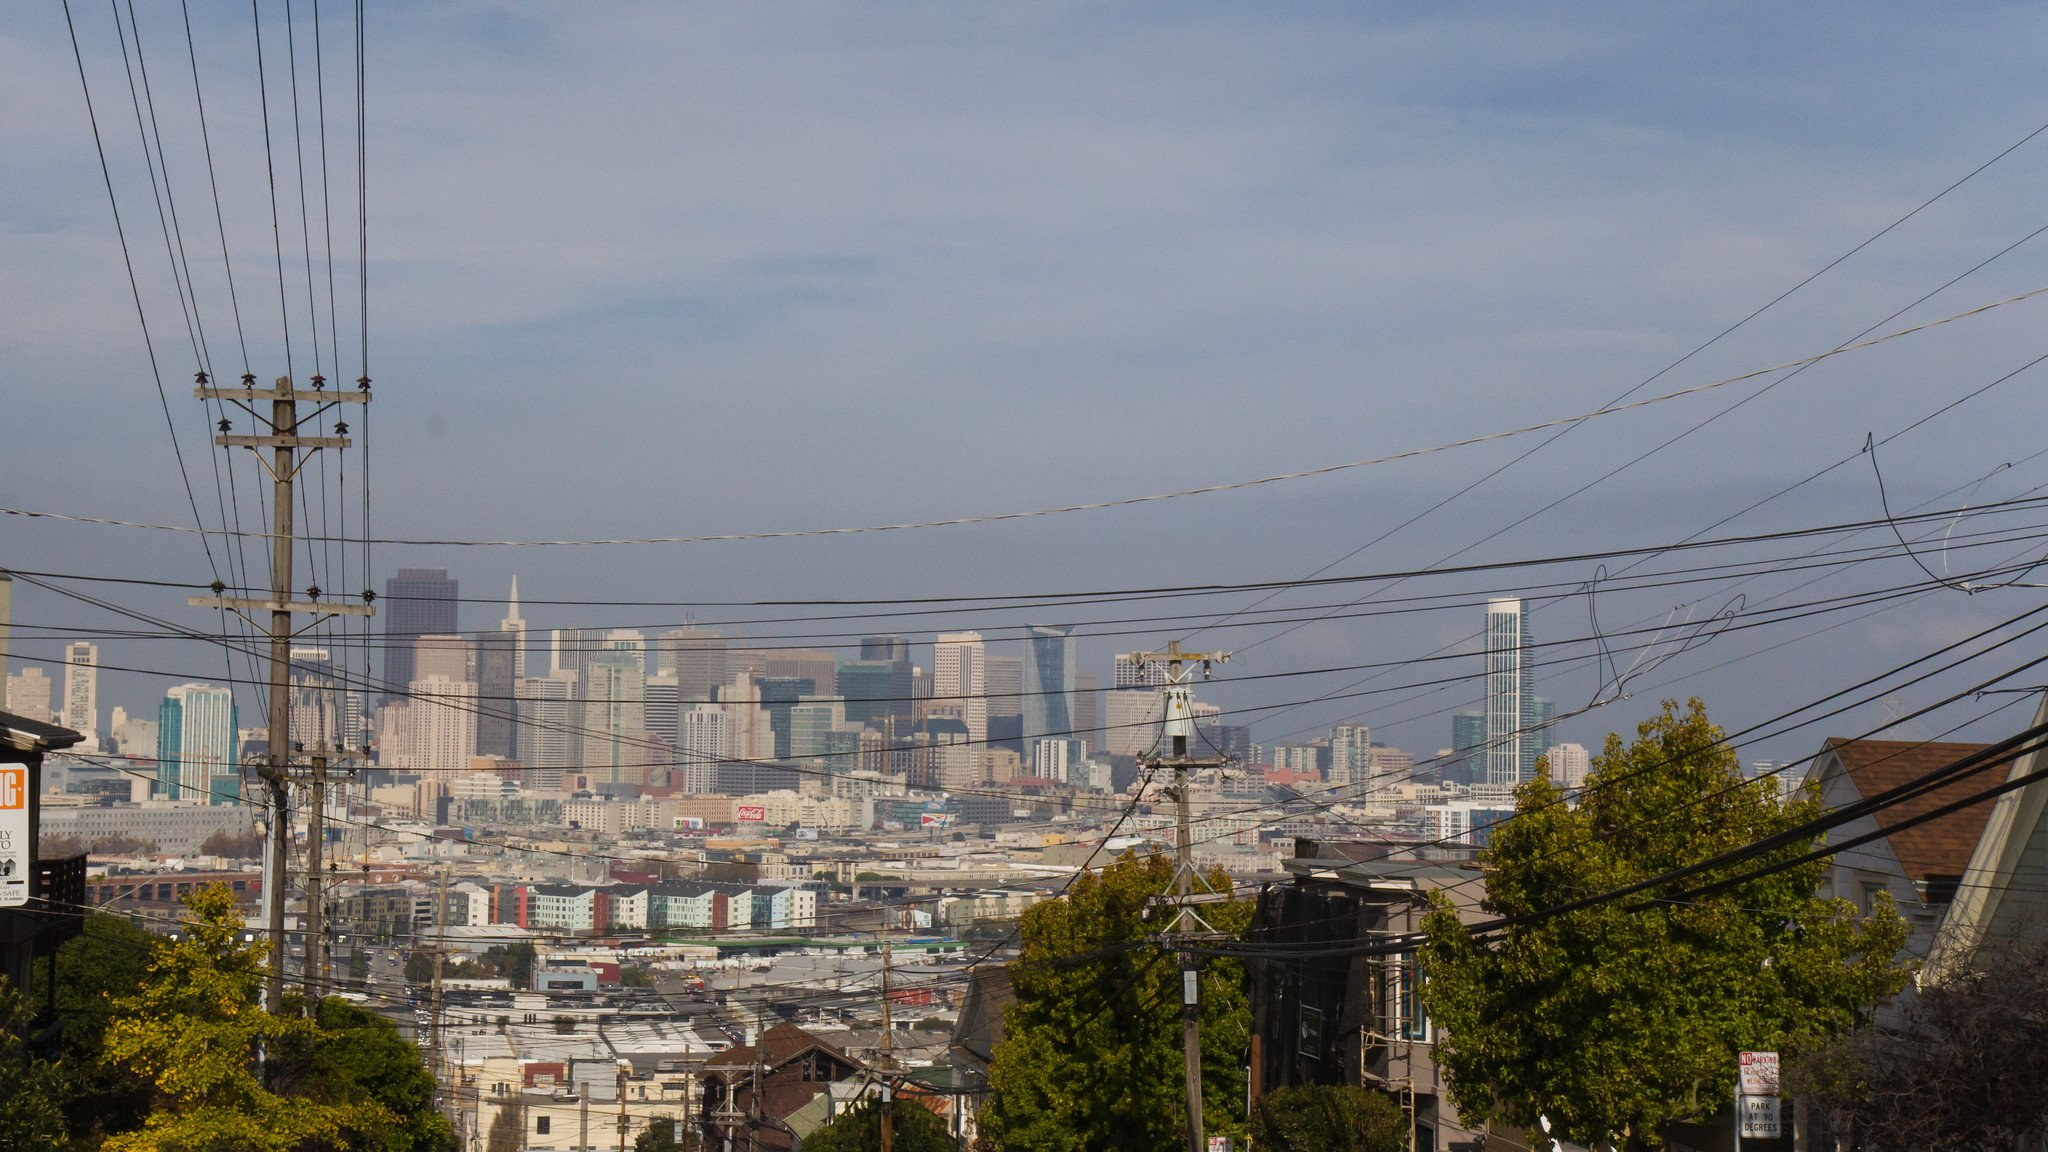 "San Francisco Skyline from De Haro & Sou"" (CC BY-SA 2.0) by Atomic Taco"